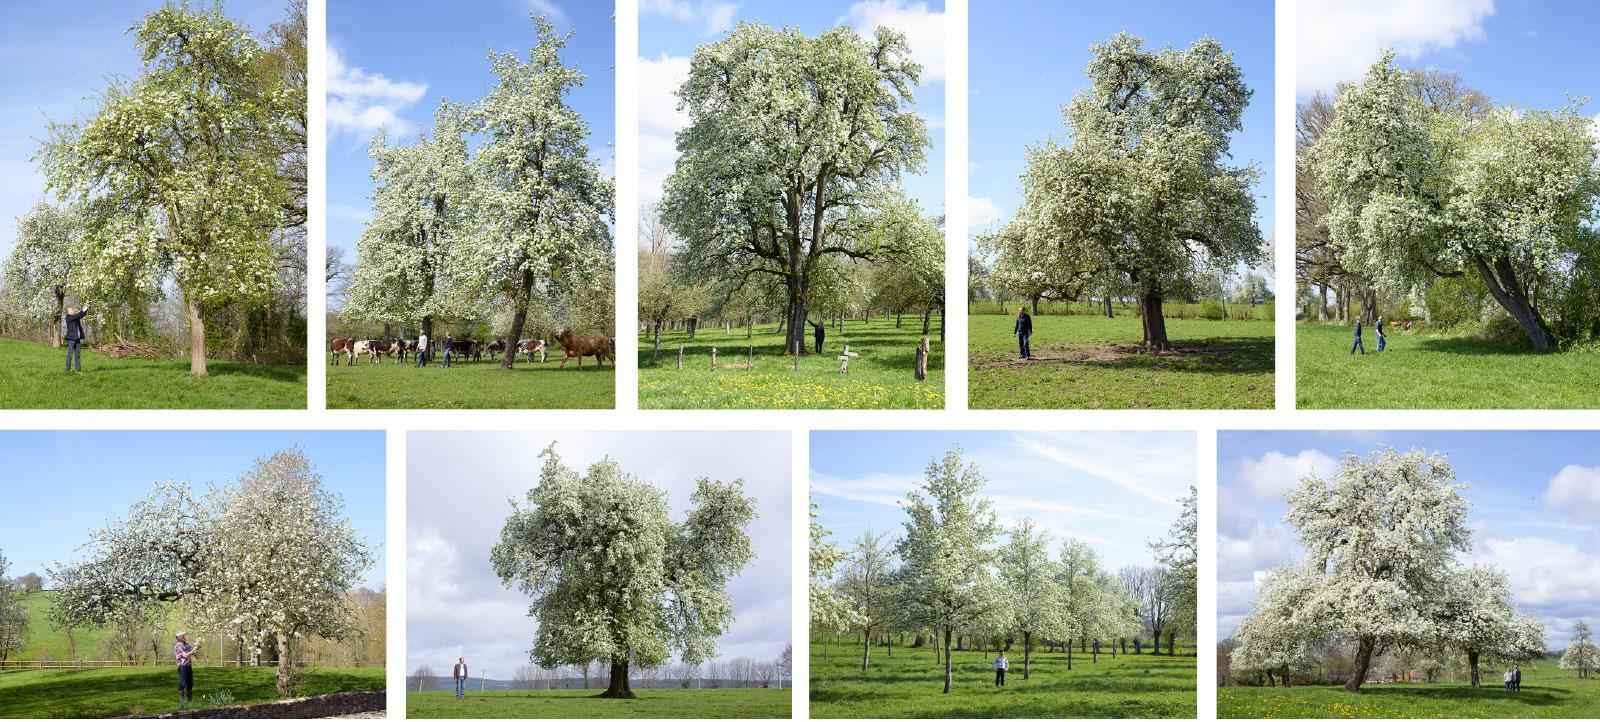 Photos Charles Fréger - Des hommes et des grands arbres